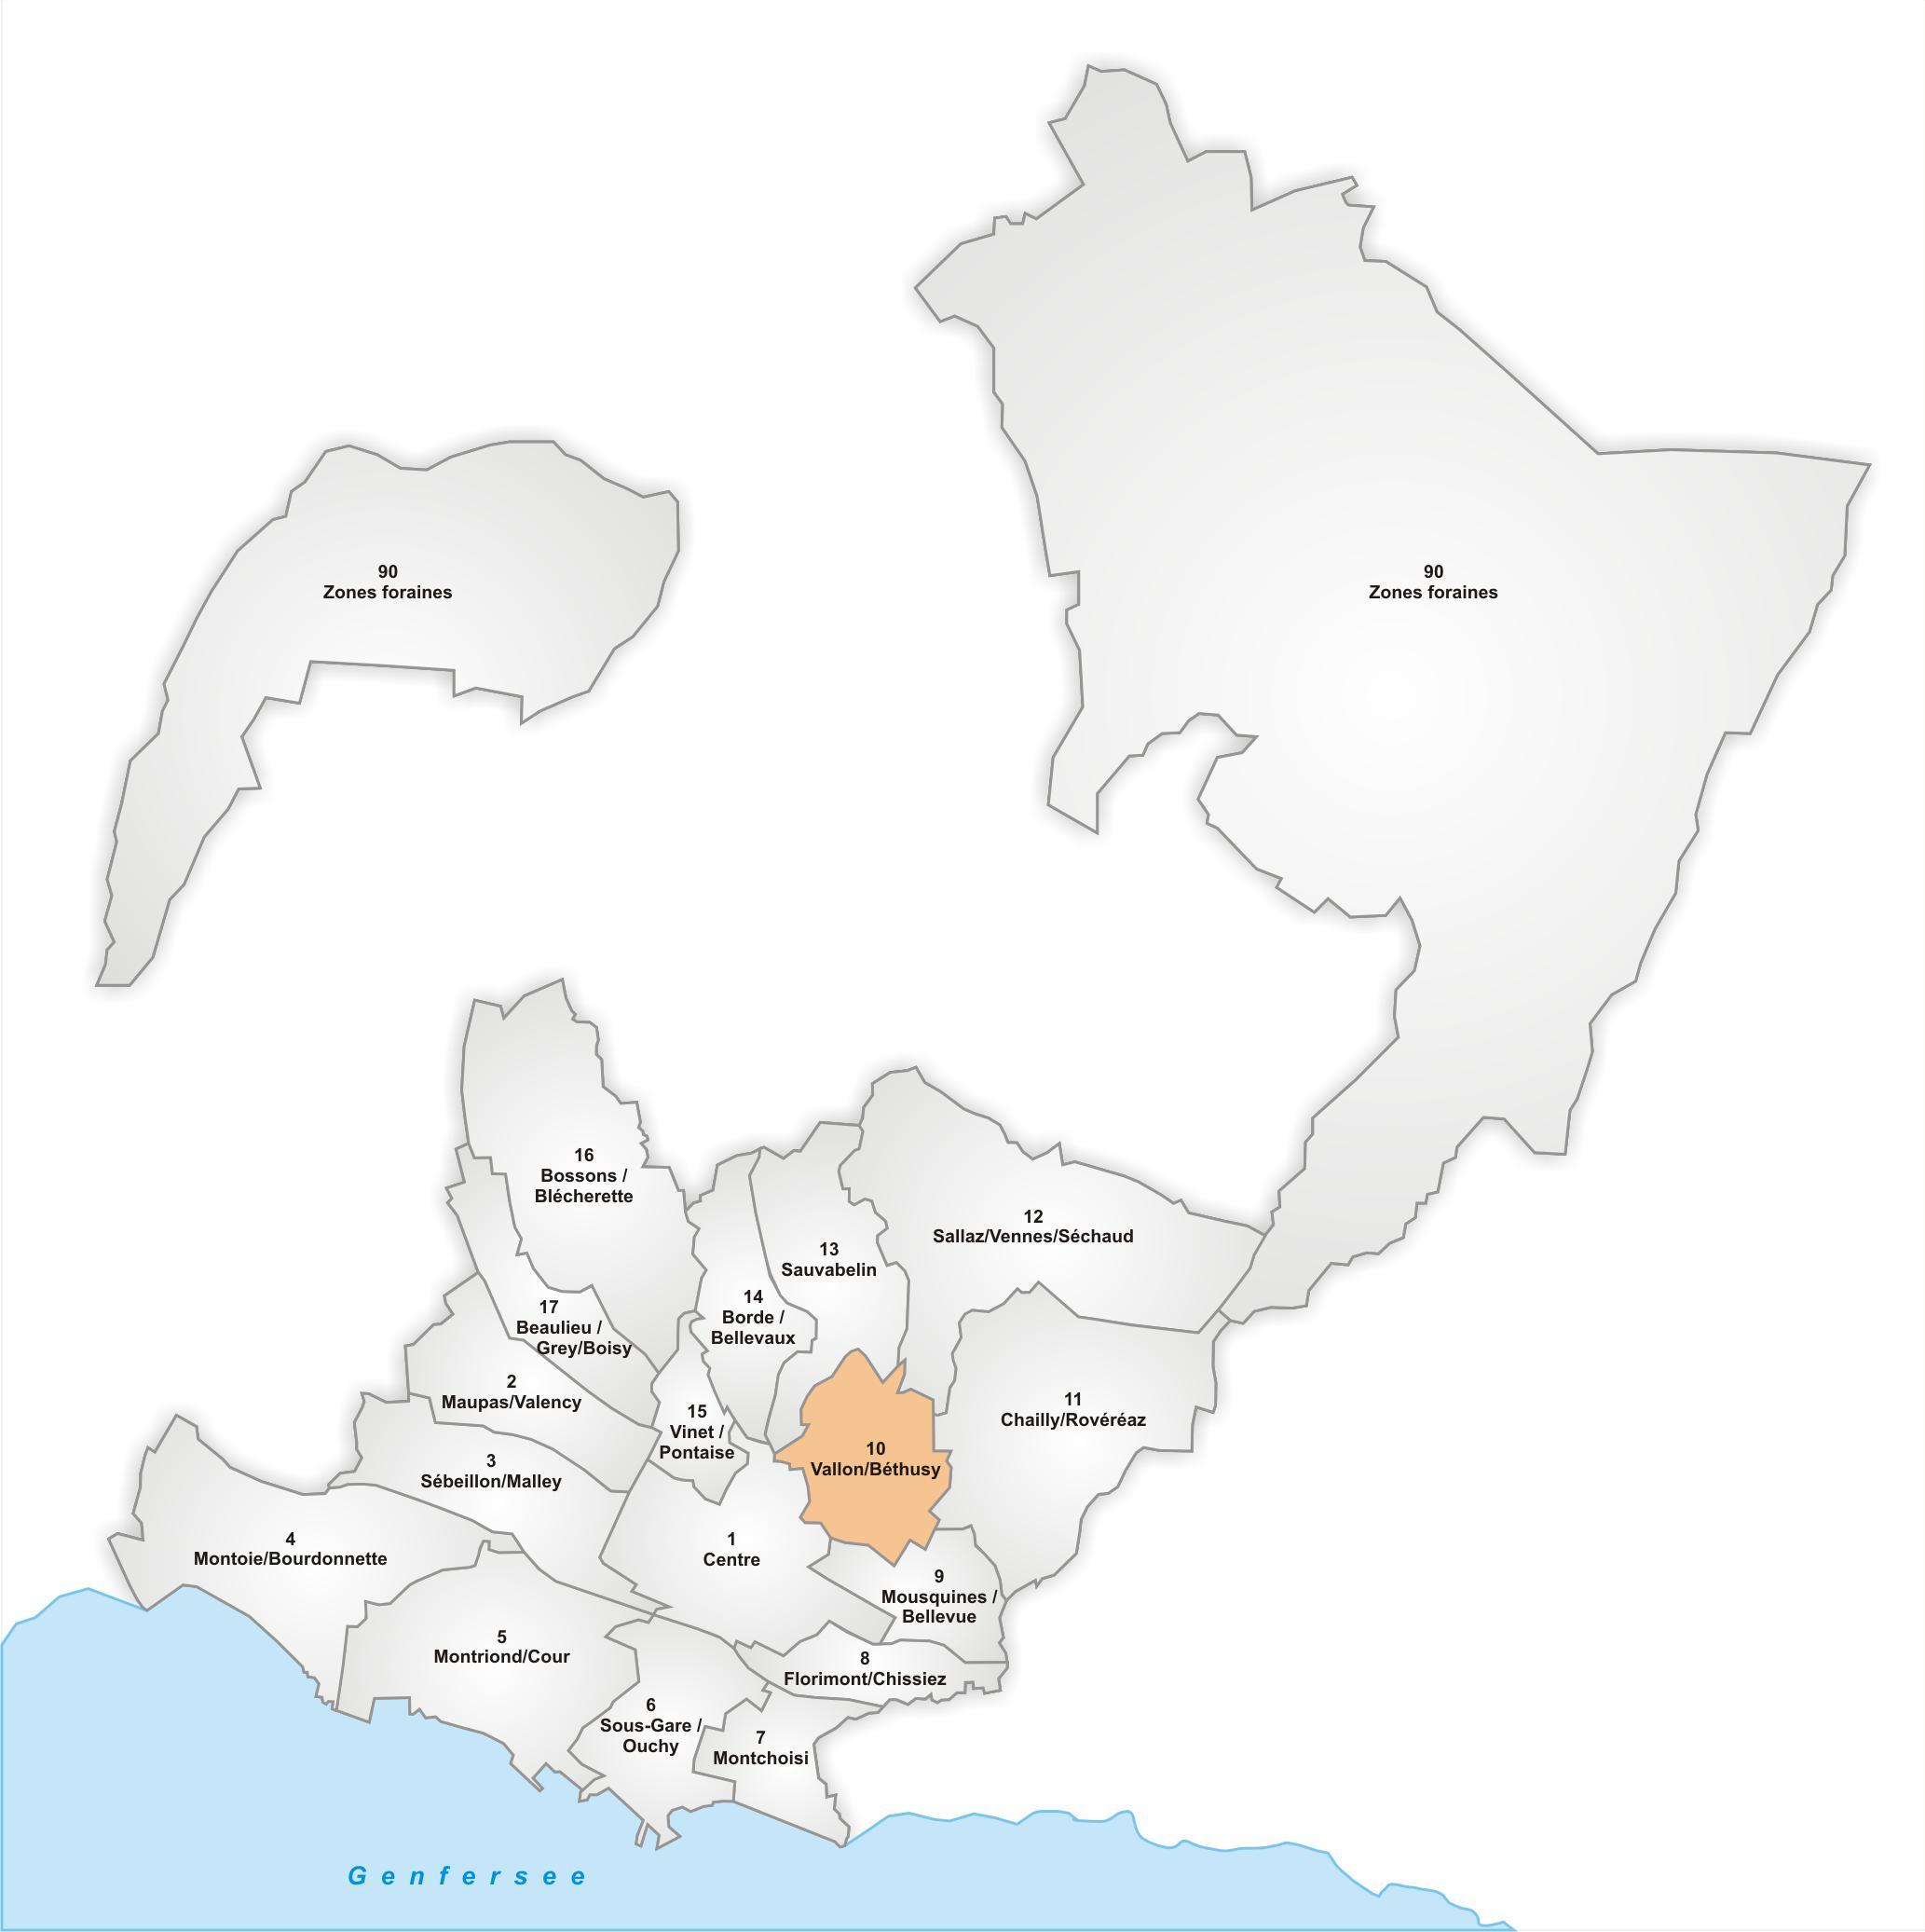 Lage des Stadtteils Vallon/Béthusy